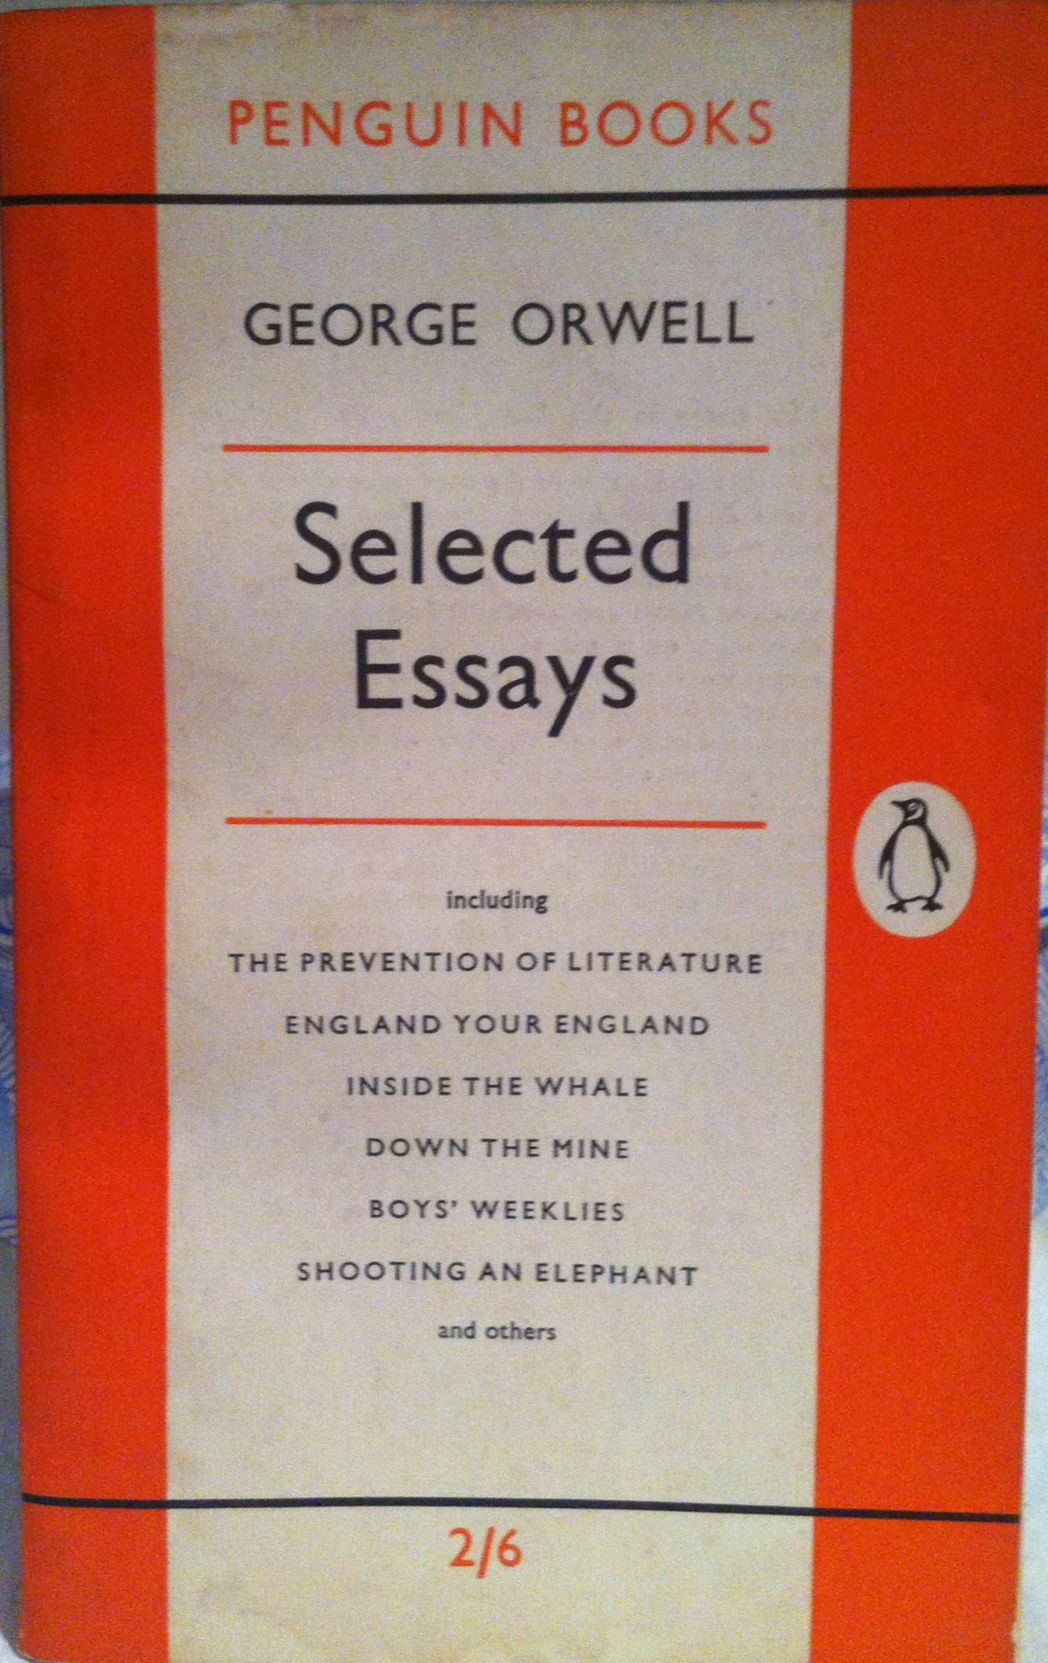 george orwell selected essays thingstodo george orwell selected essays 1957